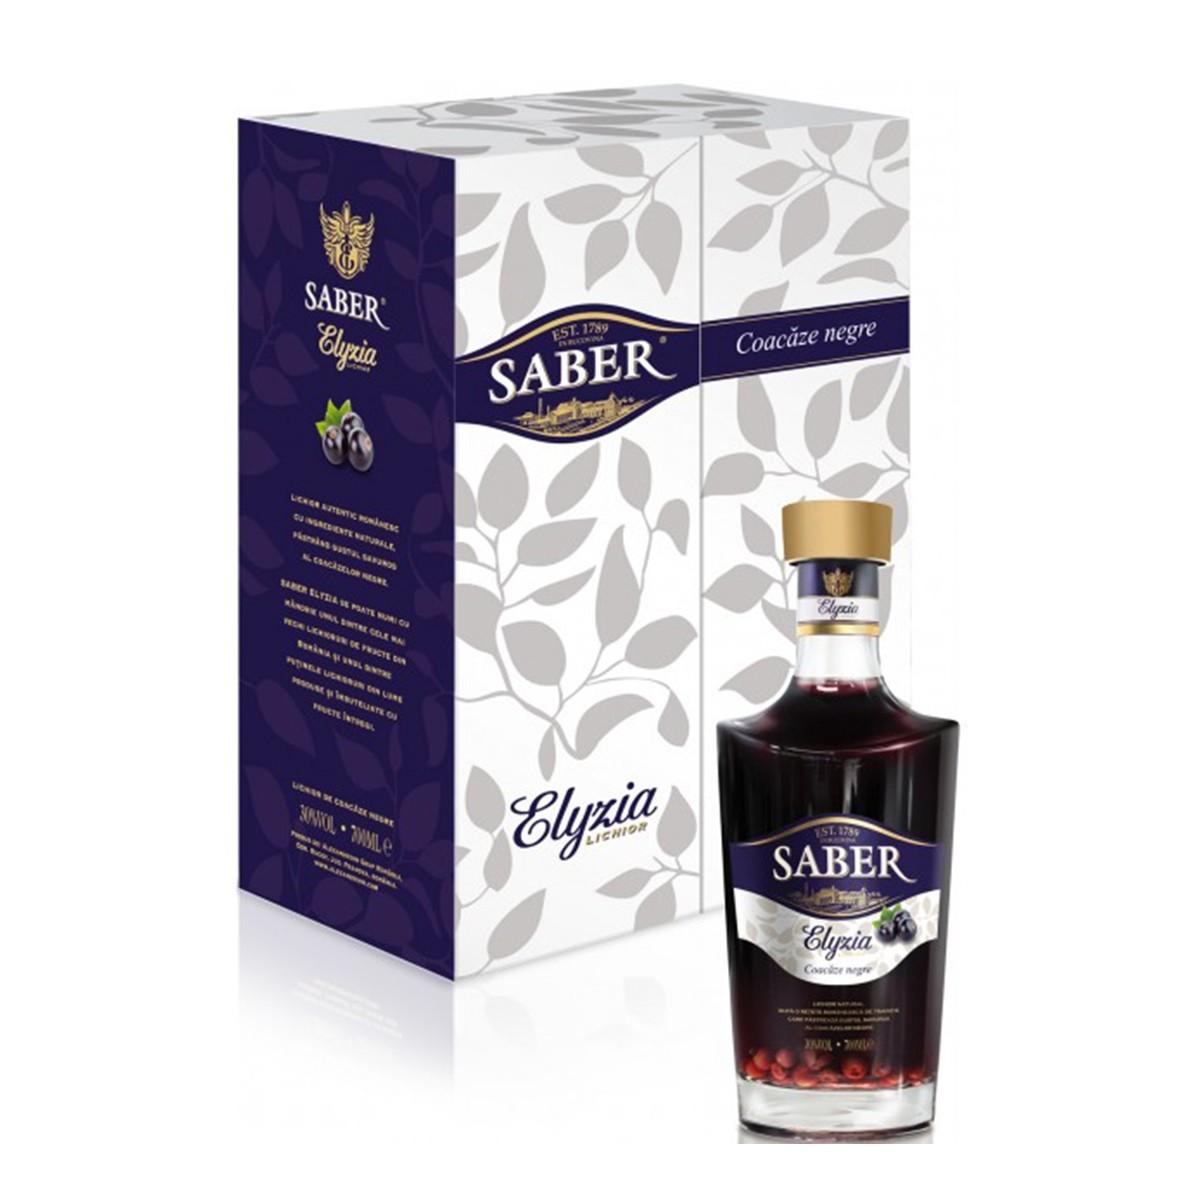 Saber Elyzia Premium Coacaze Negre 700 ml